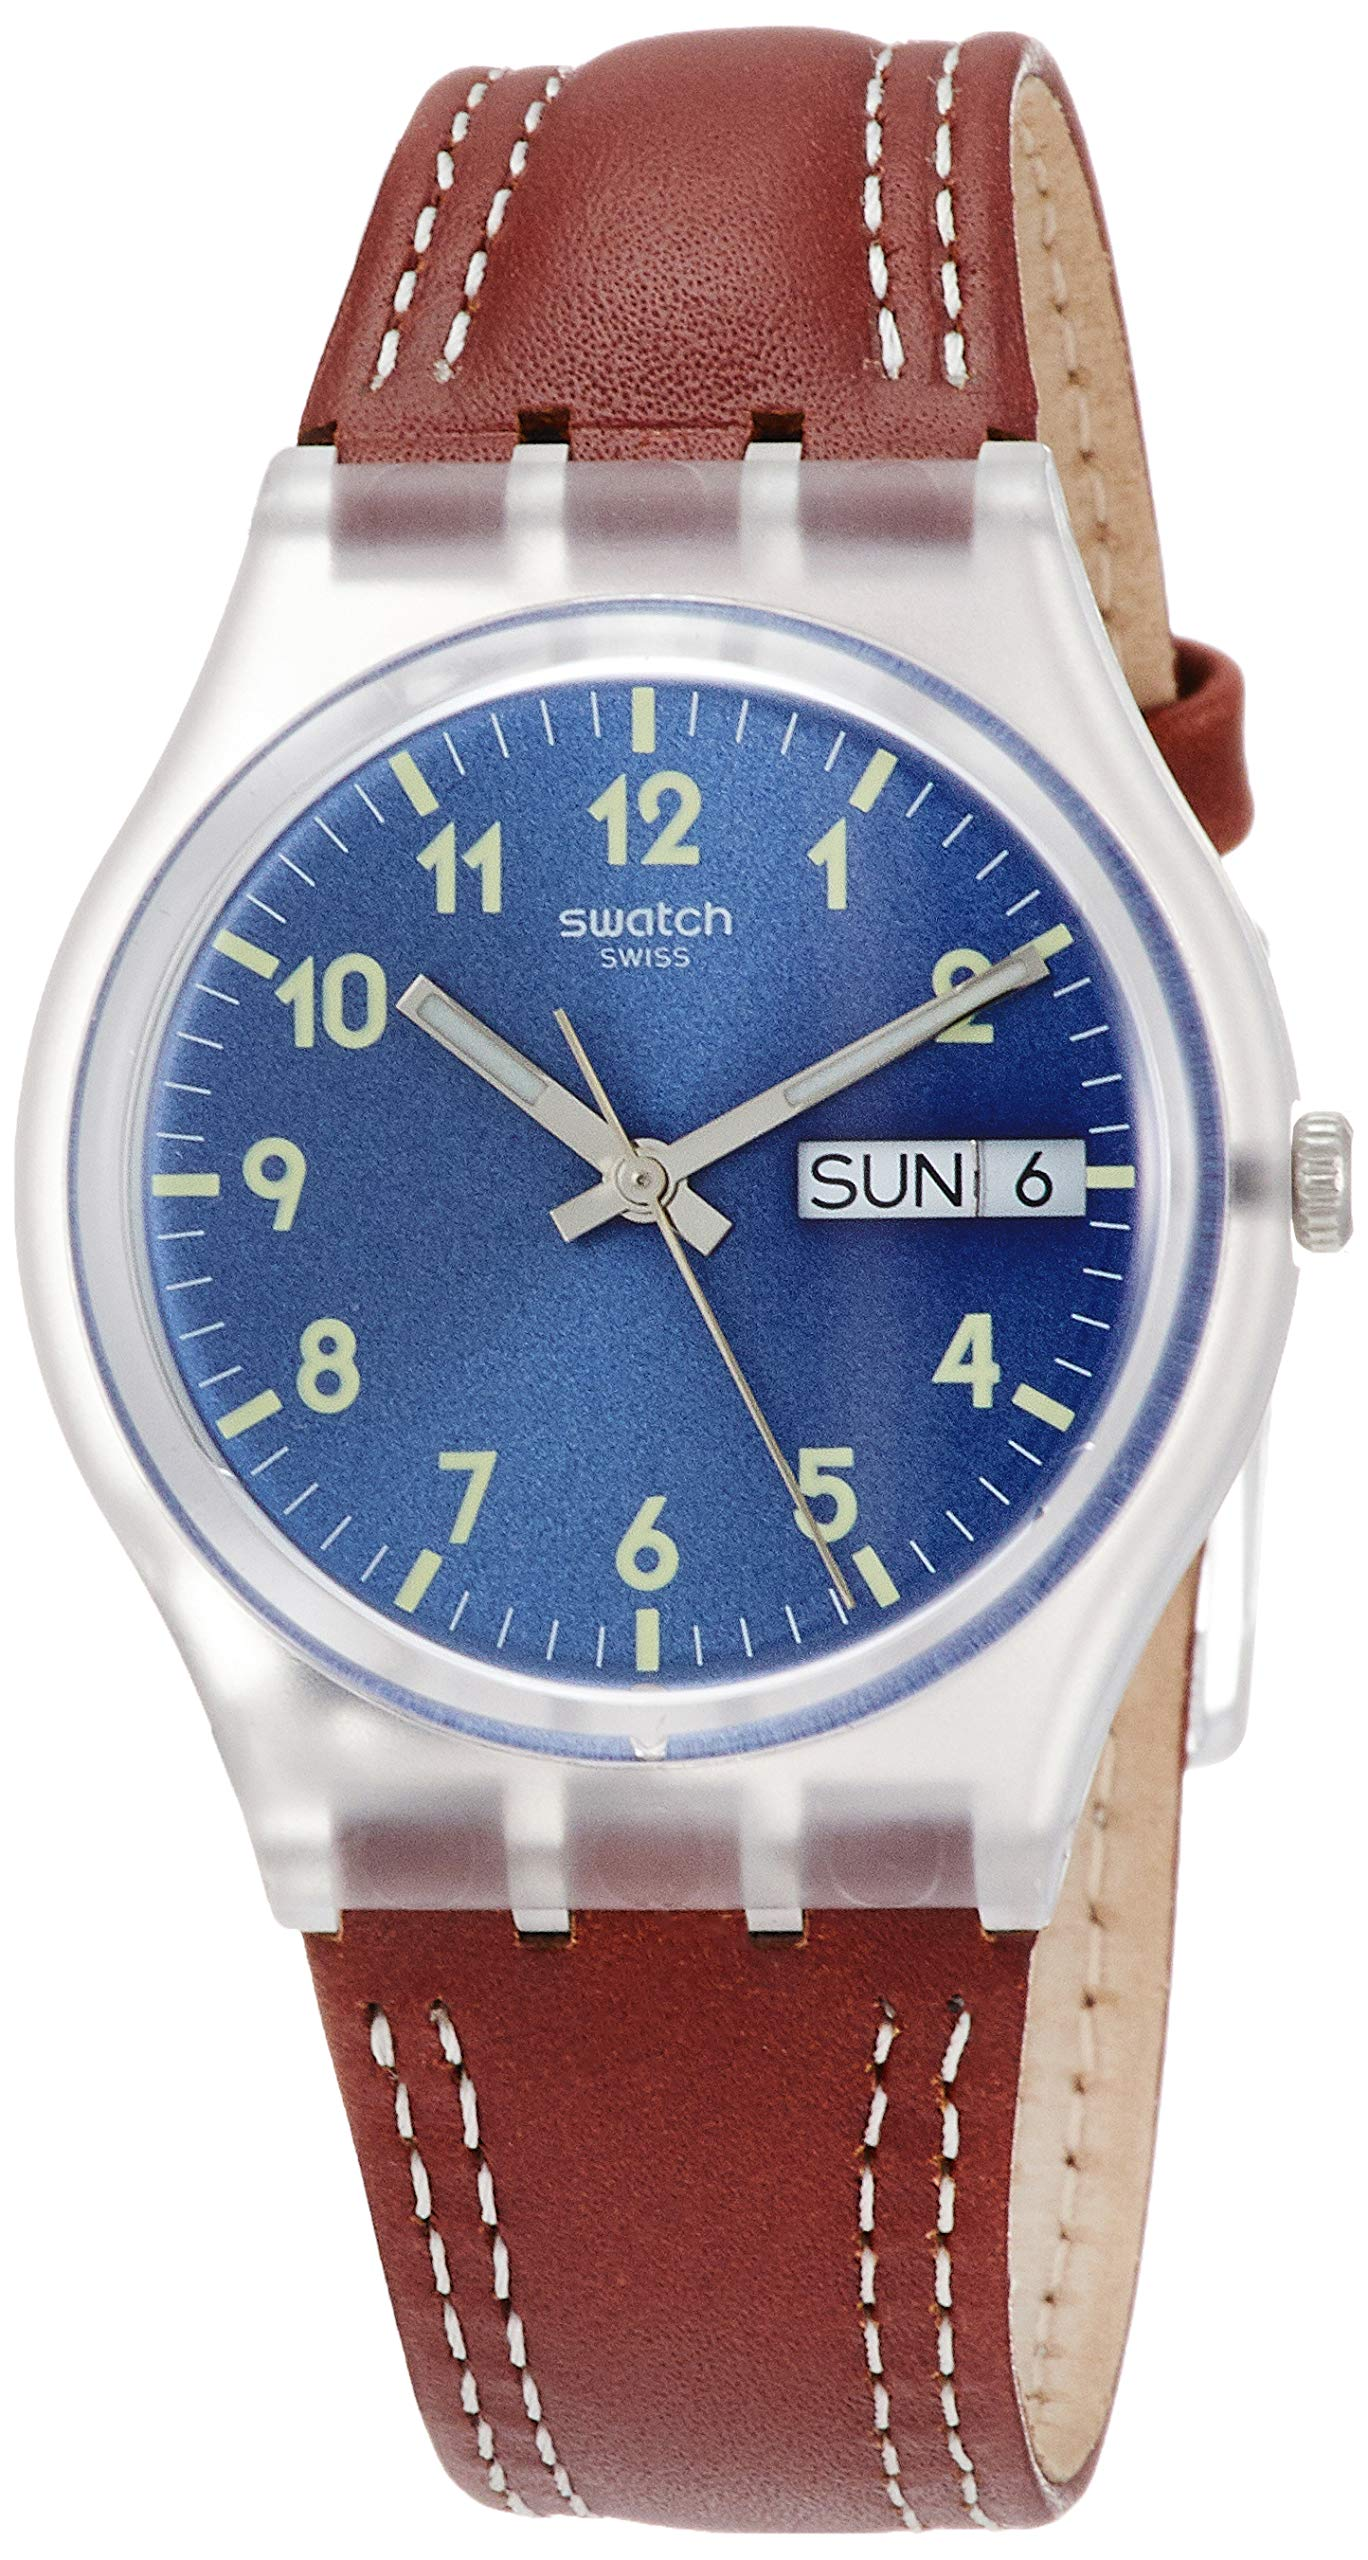 Swatch Herren Analog Quarz Uhr mit Leder Armband GE709